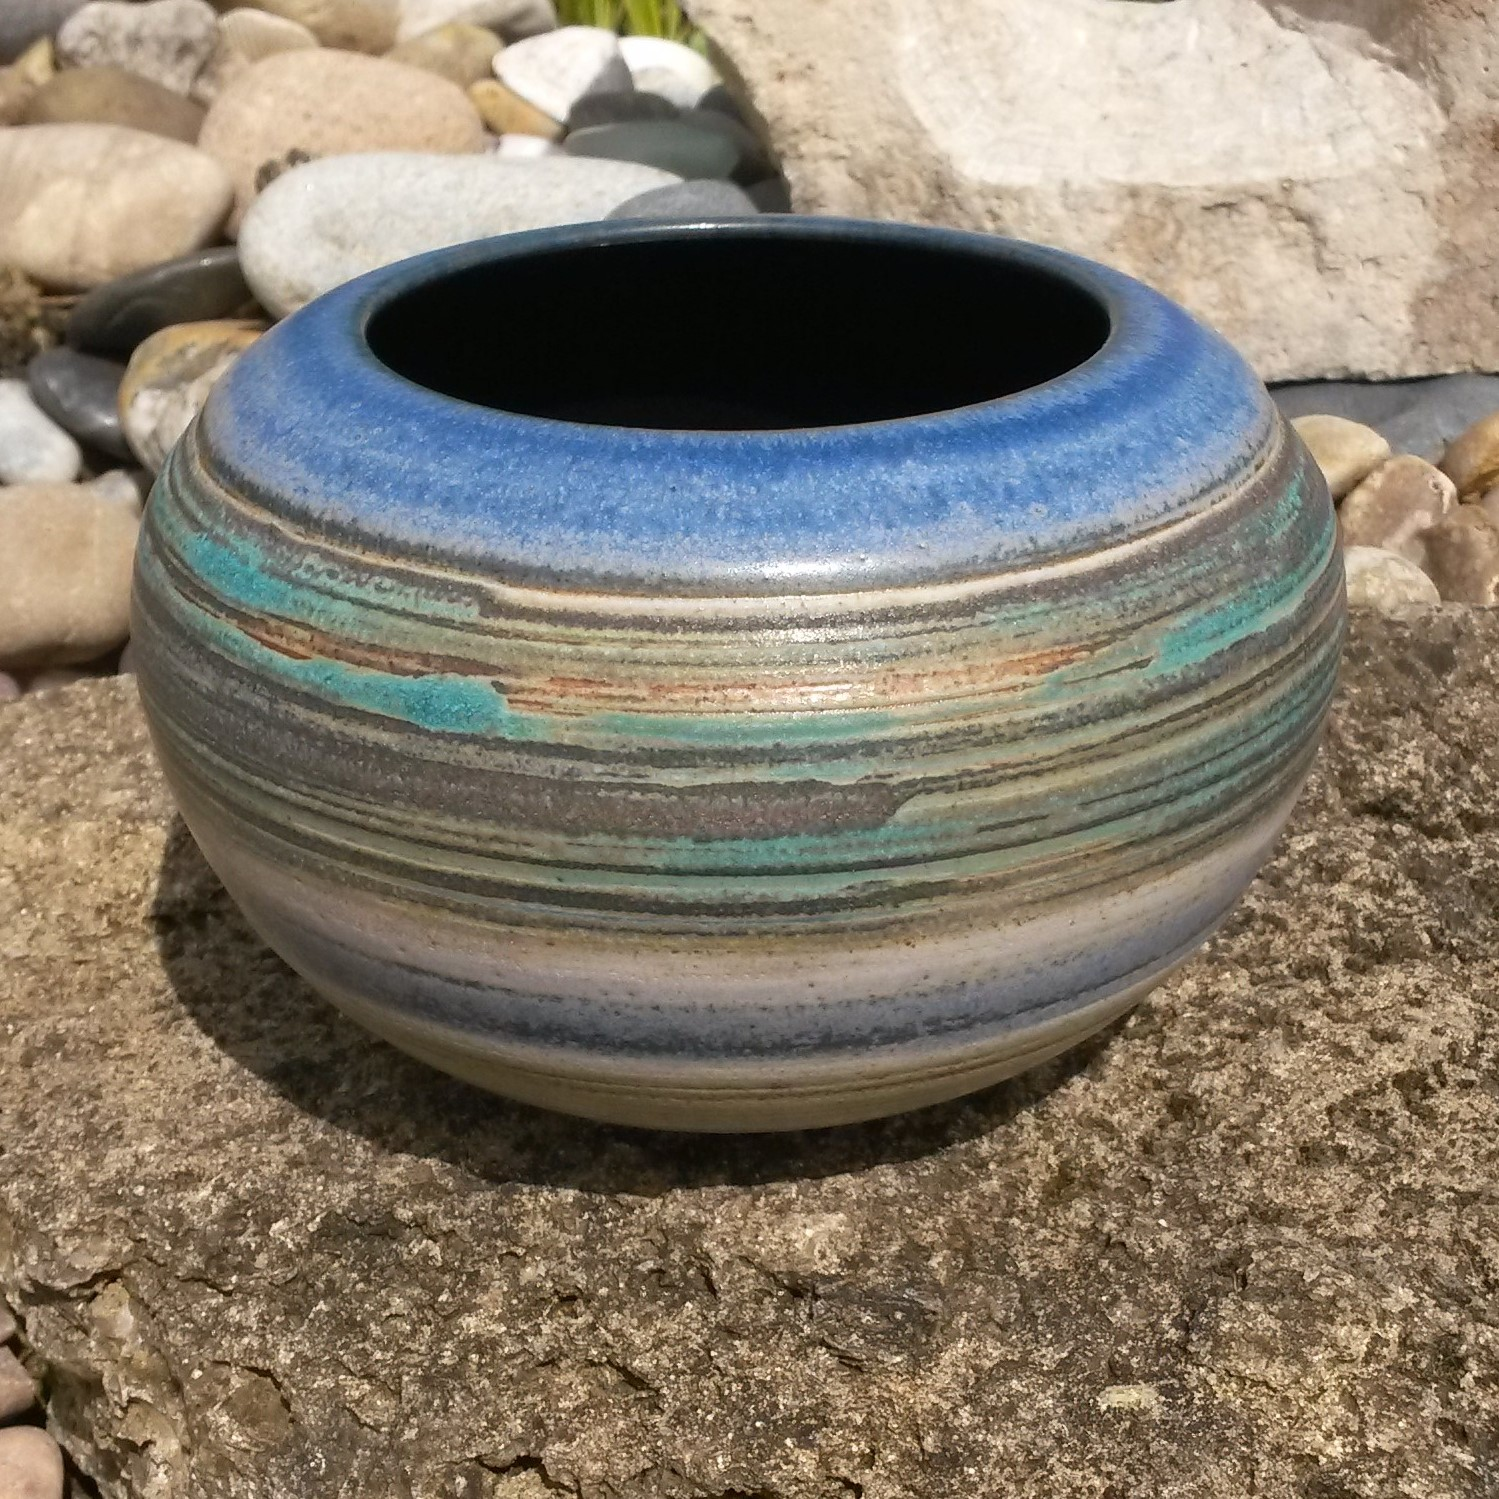 craig eyles - website Ball vessel2.jpg